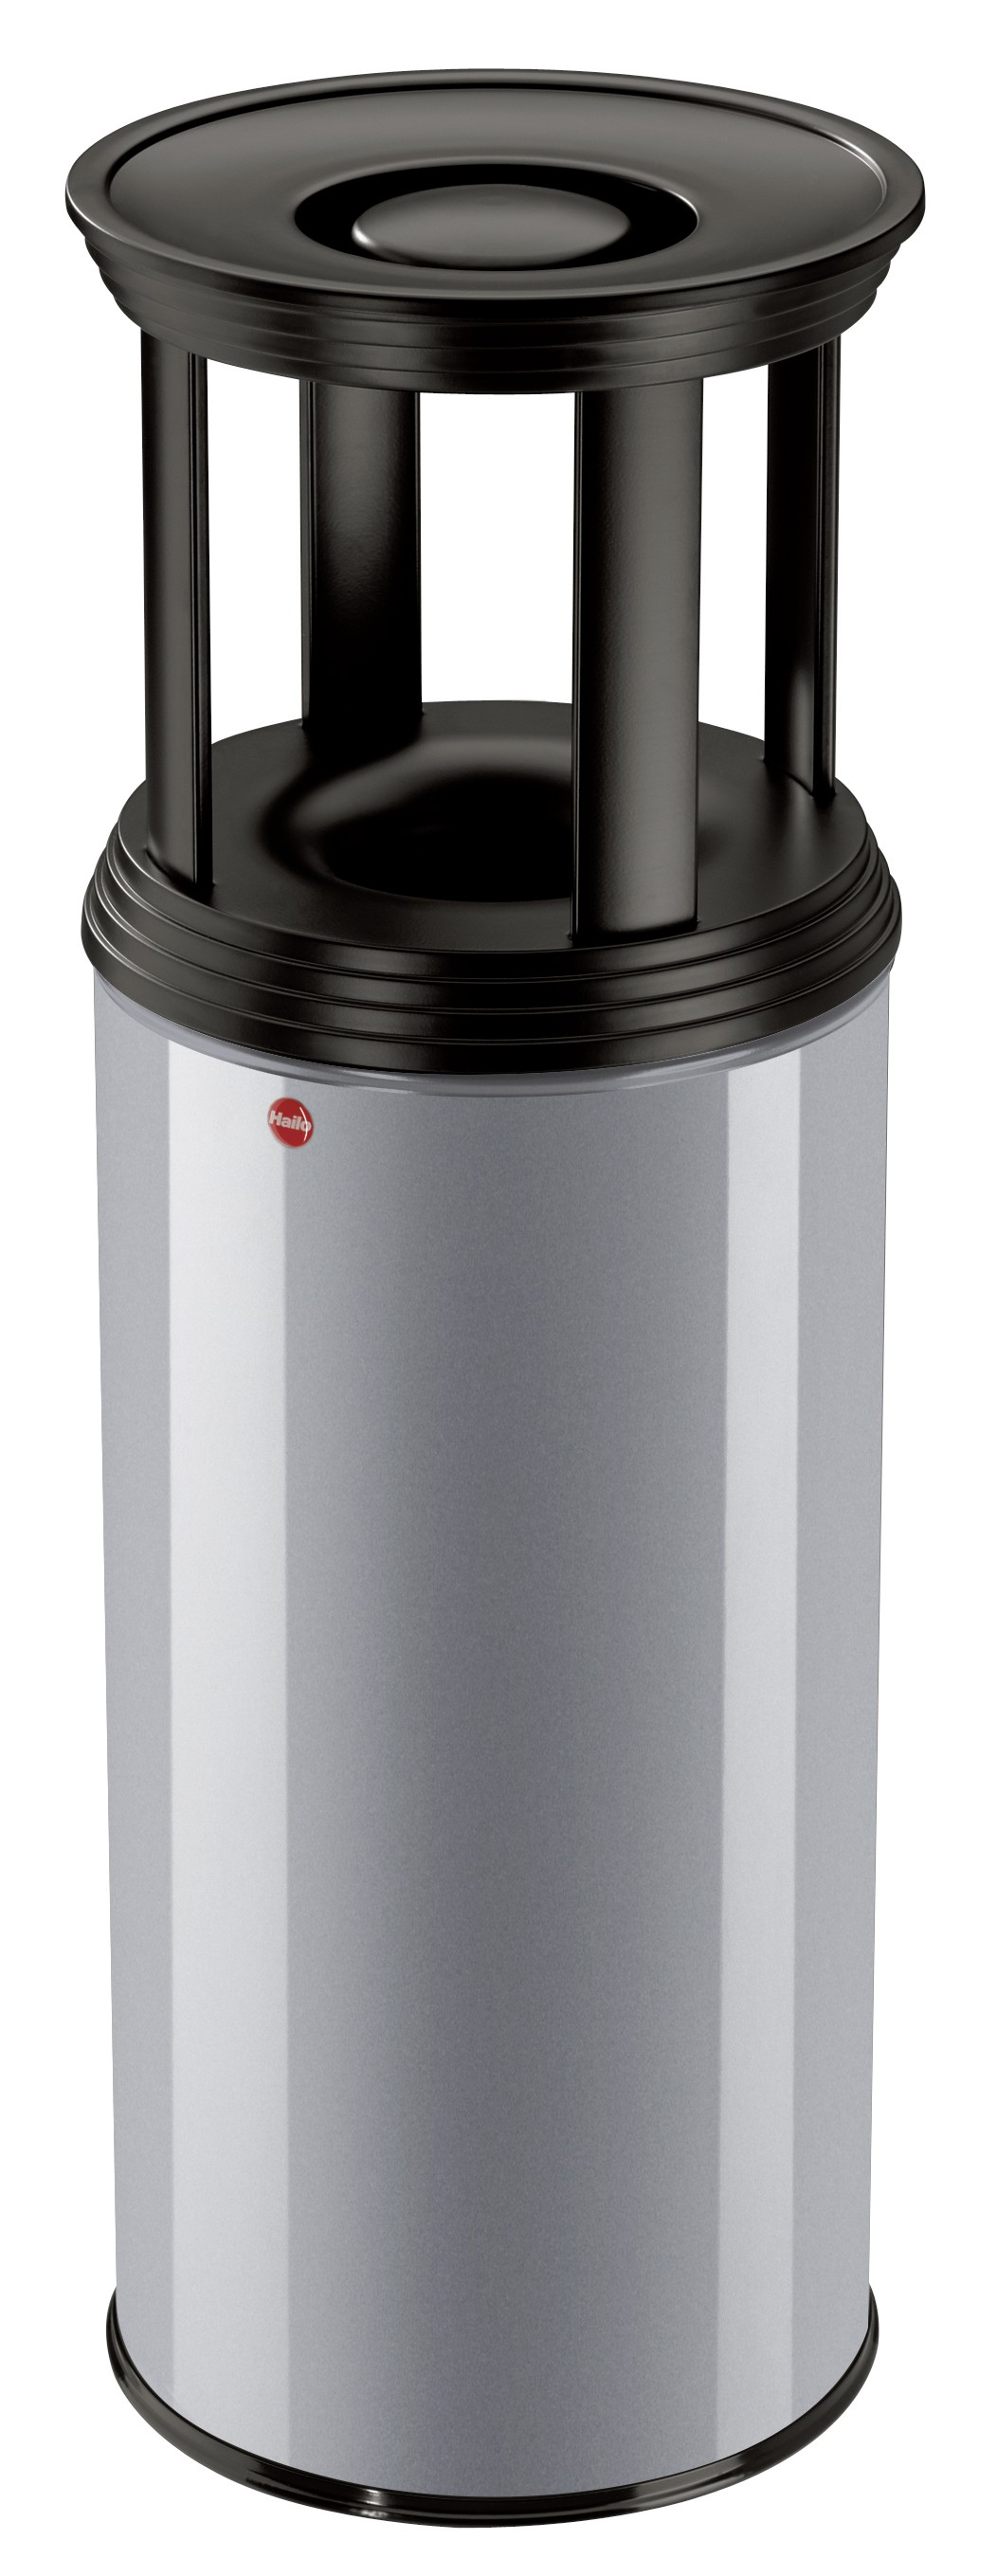 Hailo ProfiLine Combi plus XL, 45 Liter, Silber, Ascher-Papierkorb-Kombination